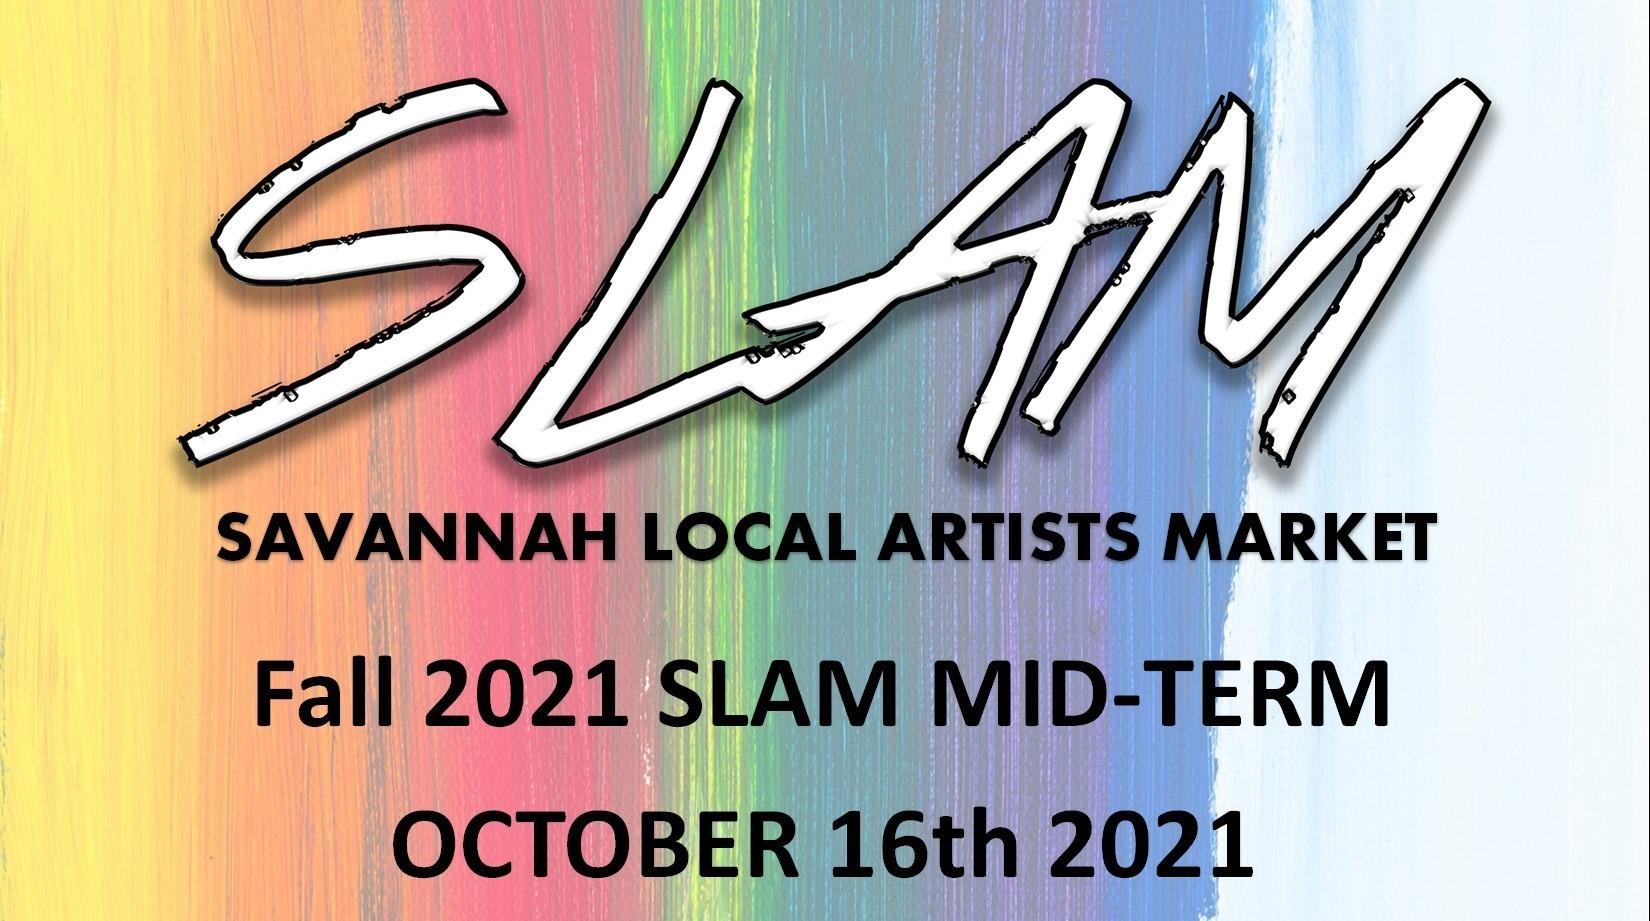 SLAM MID-TERM - SAVANNAH LOCAL ARTIST MARKET